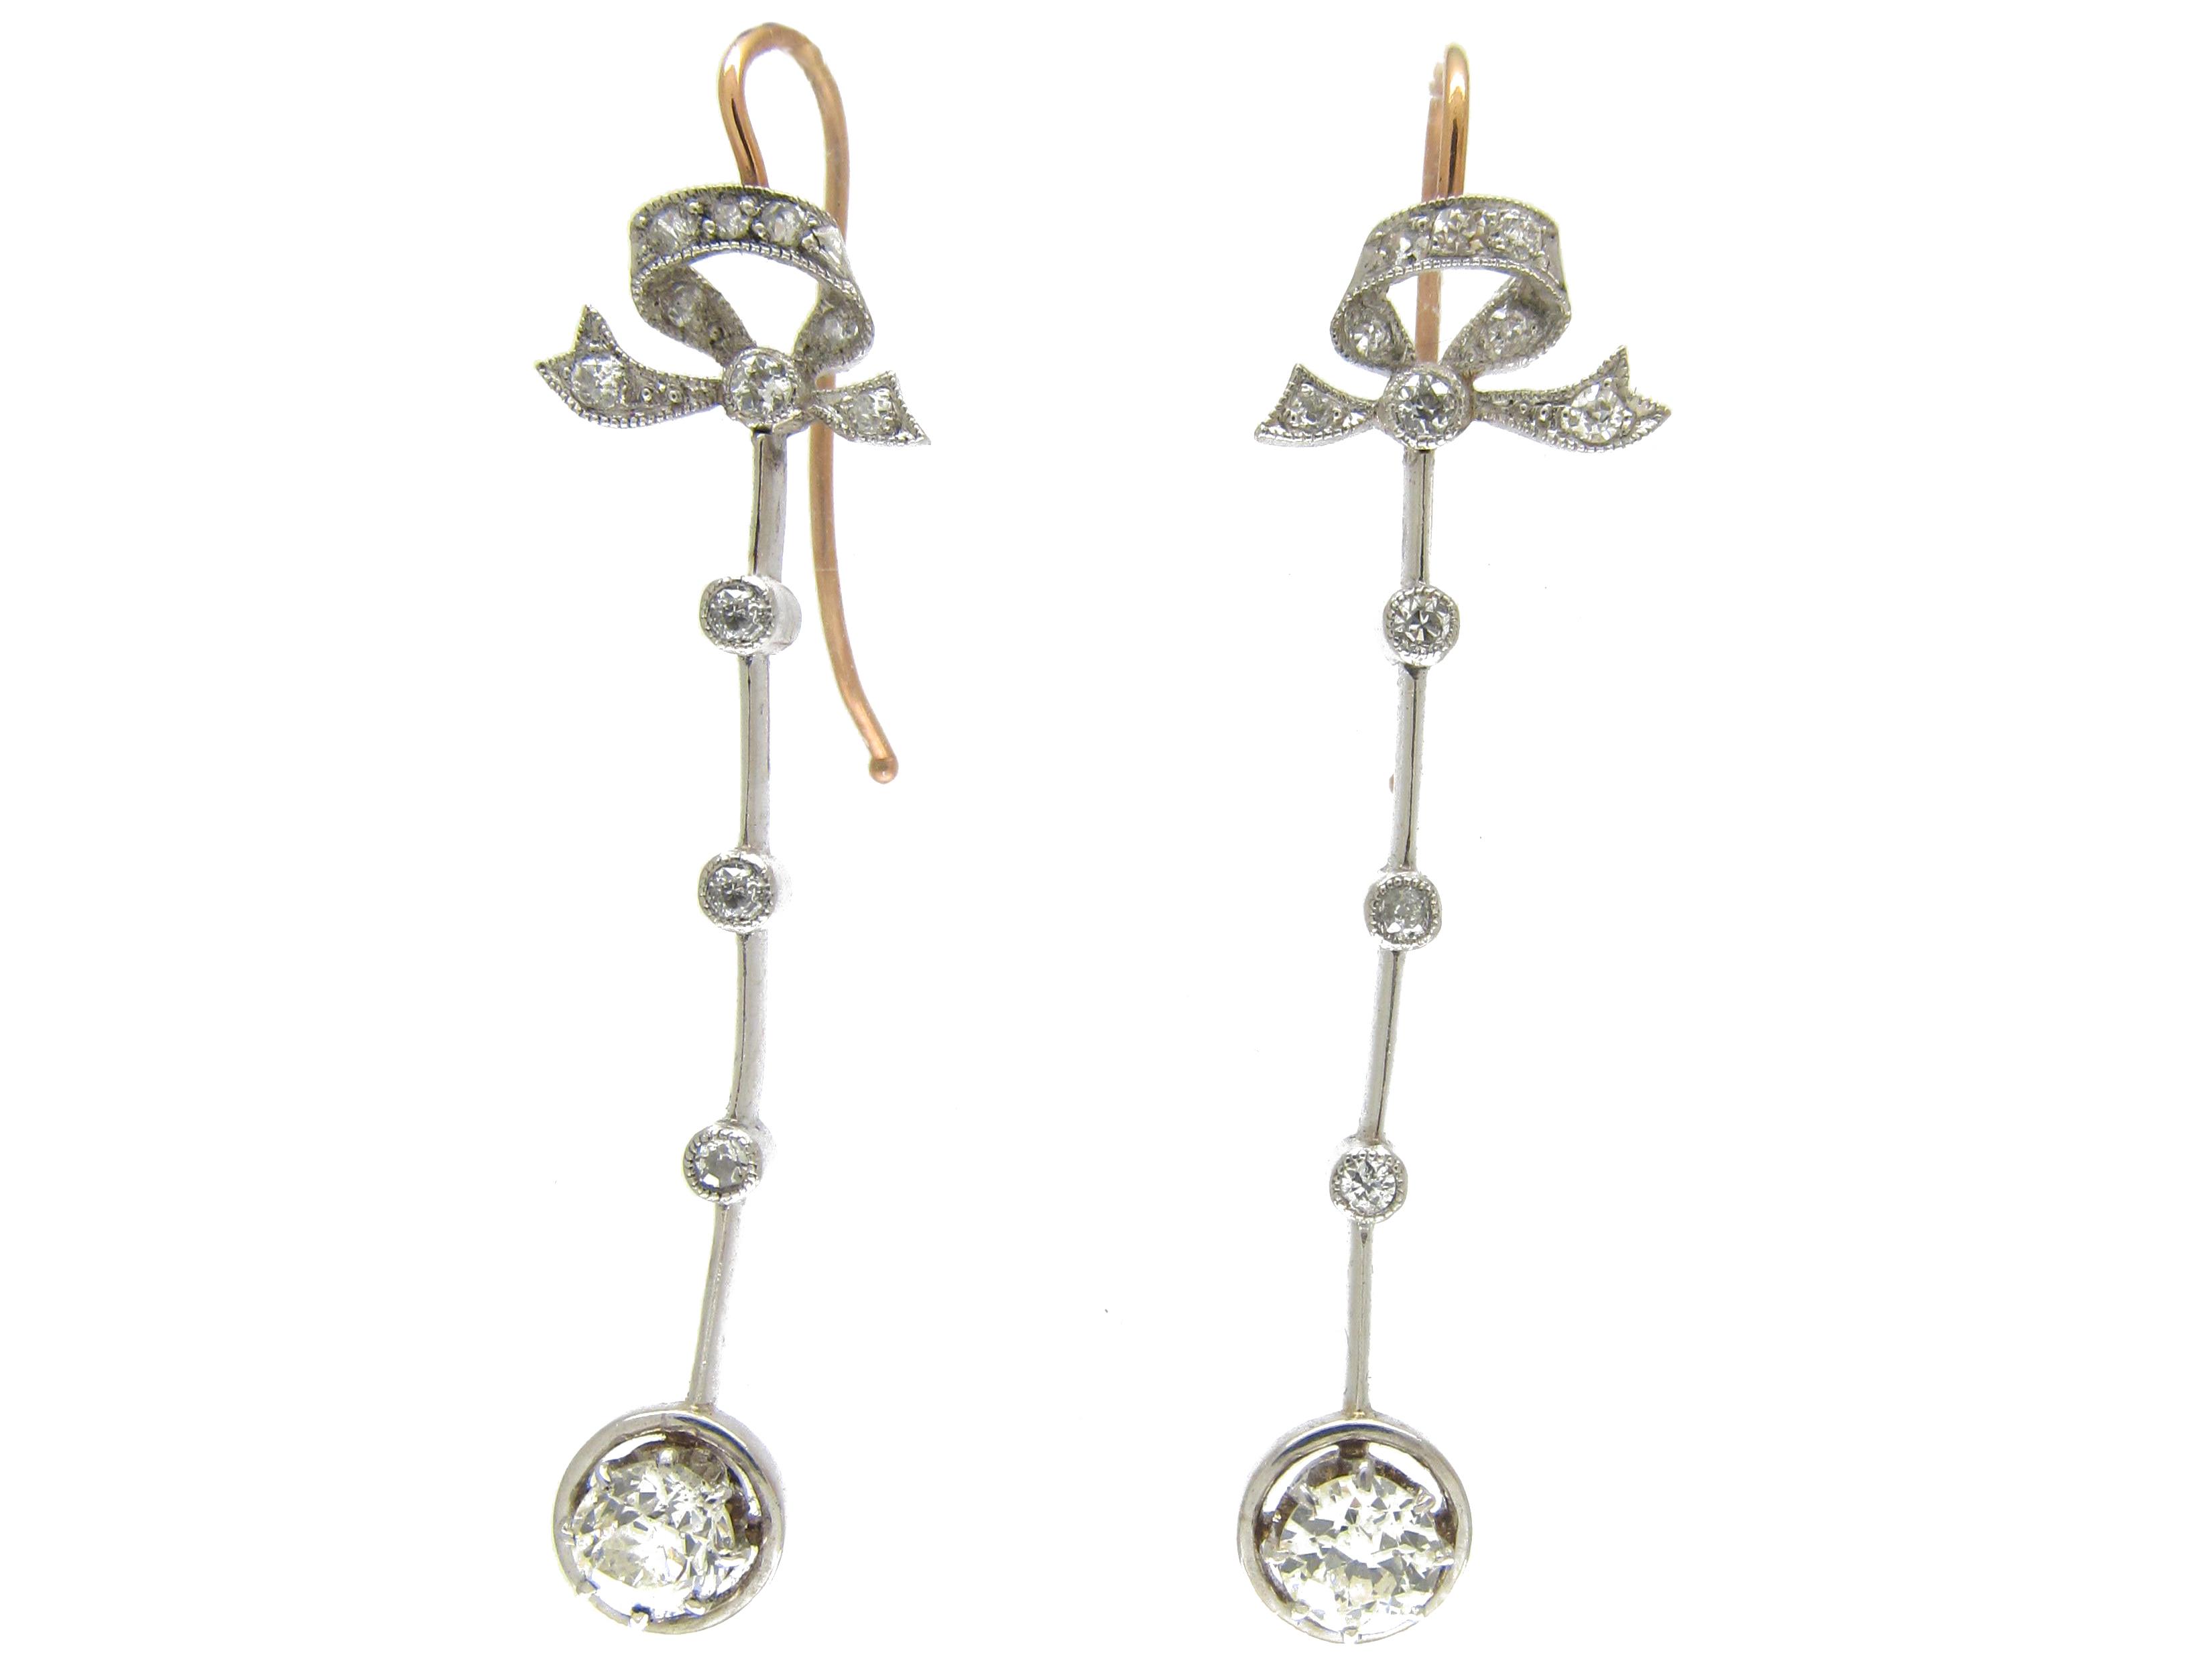 Edwardian Bow Top Platinum & Diamond Drop Earrings